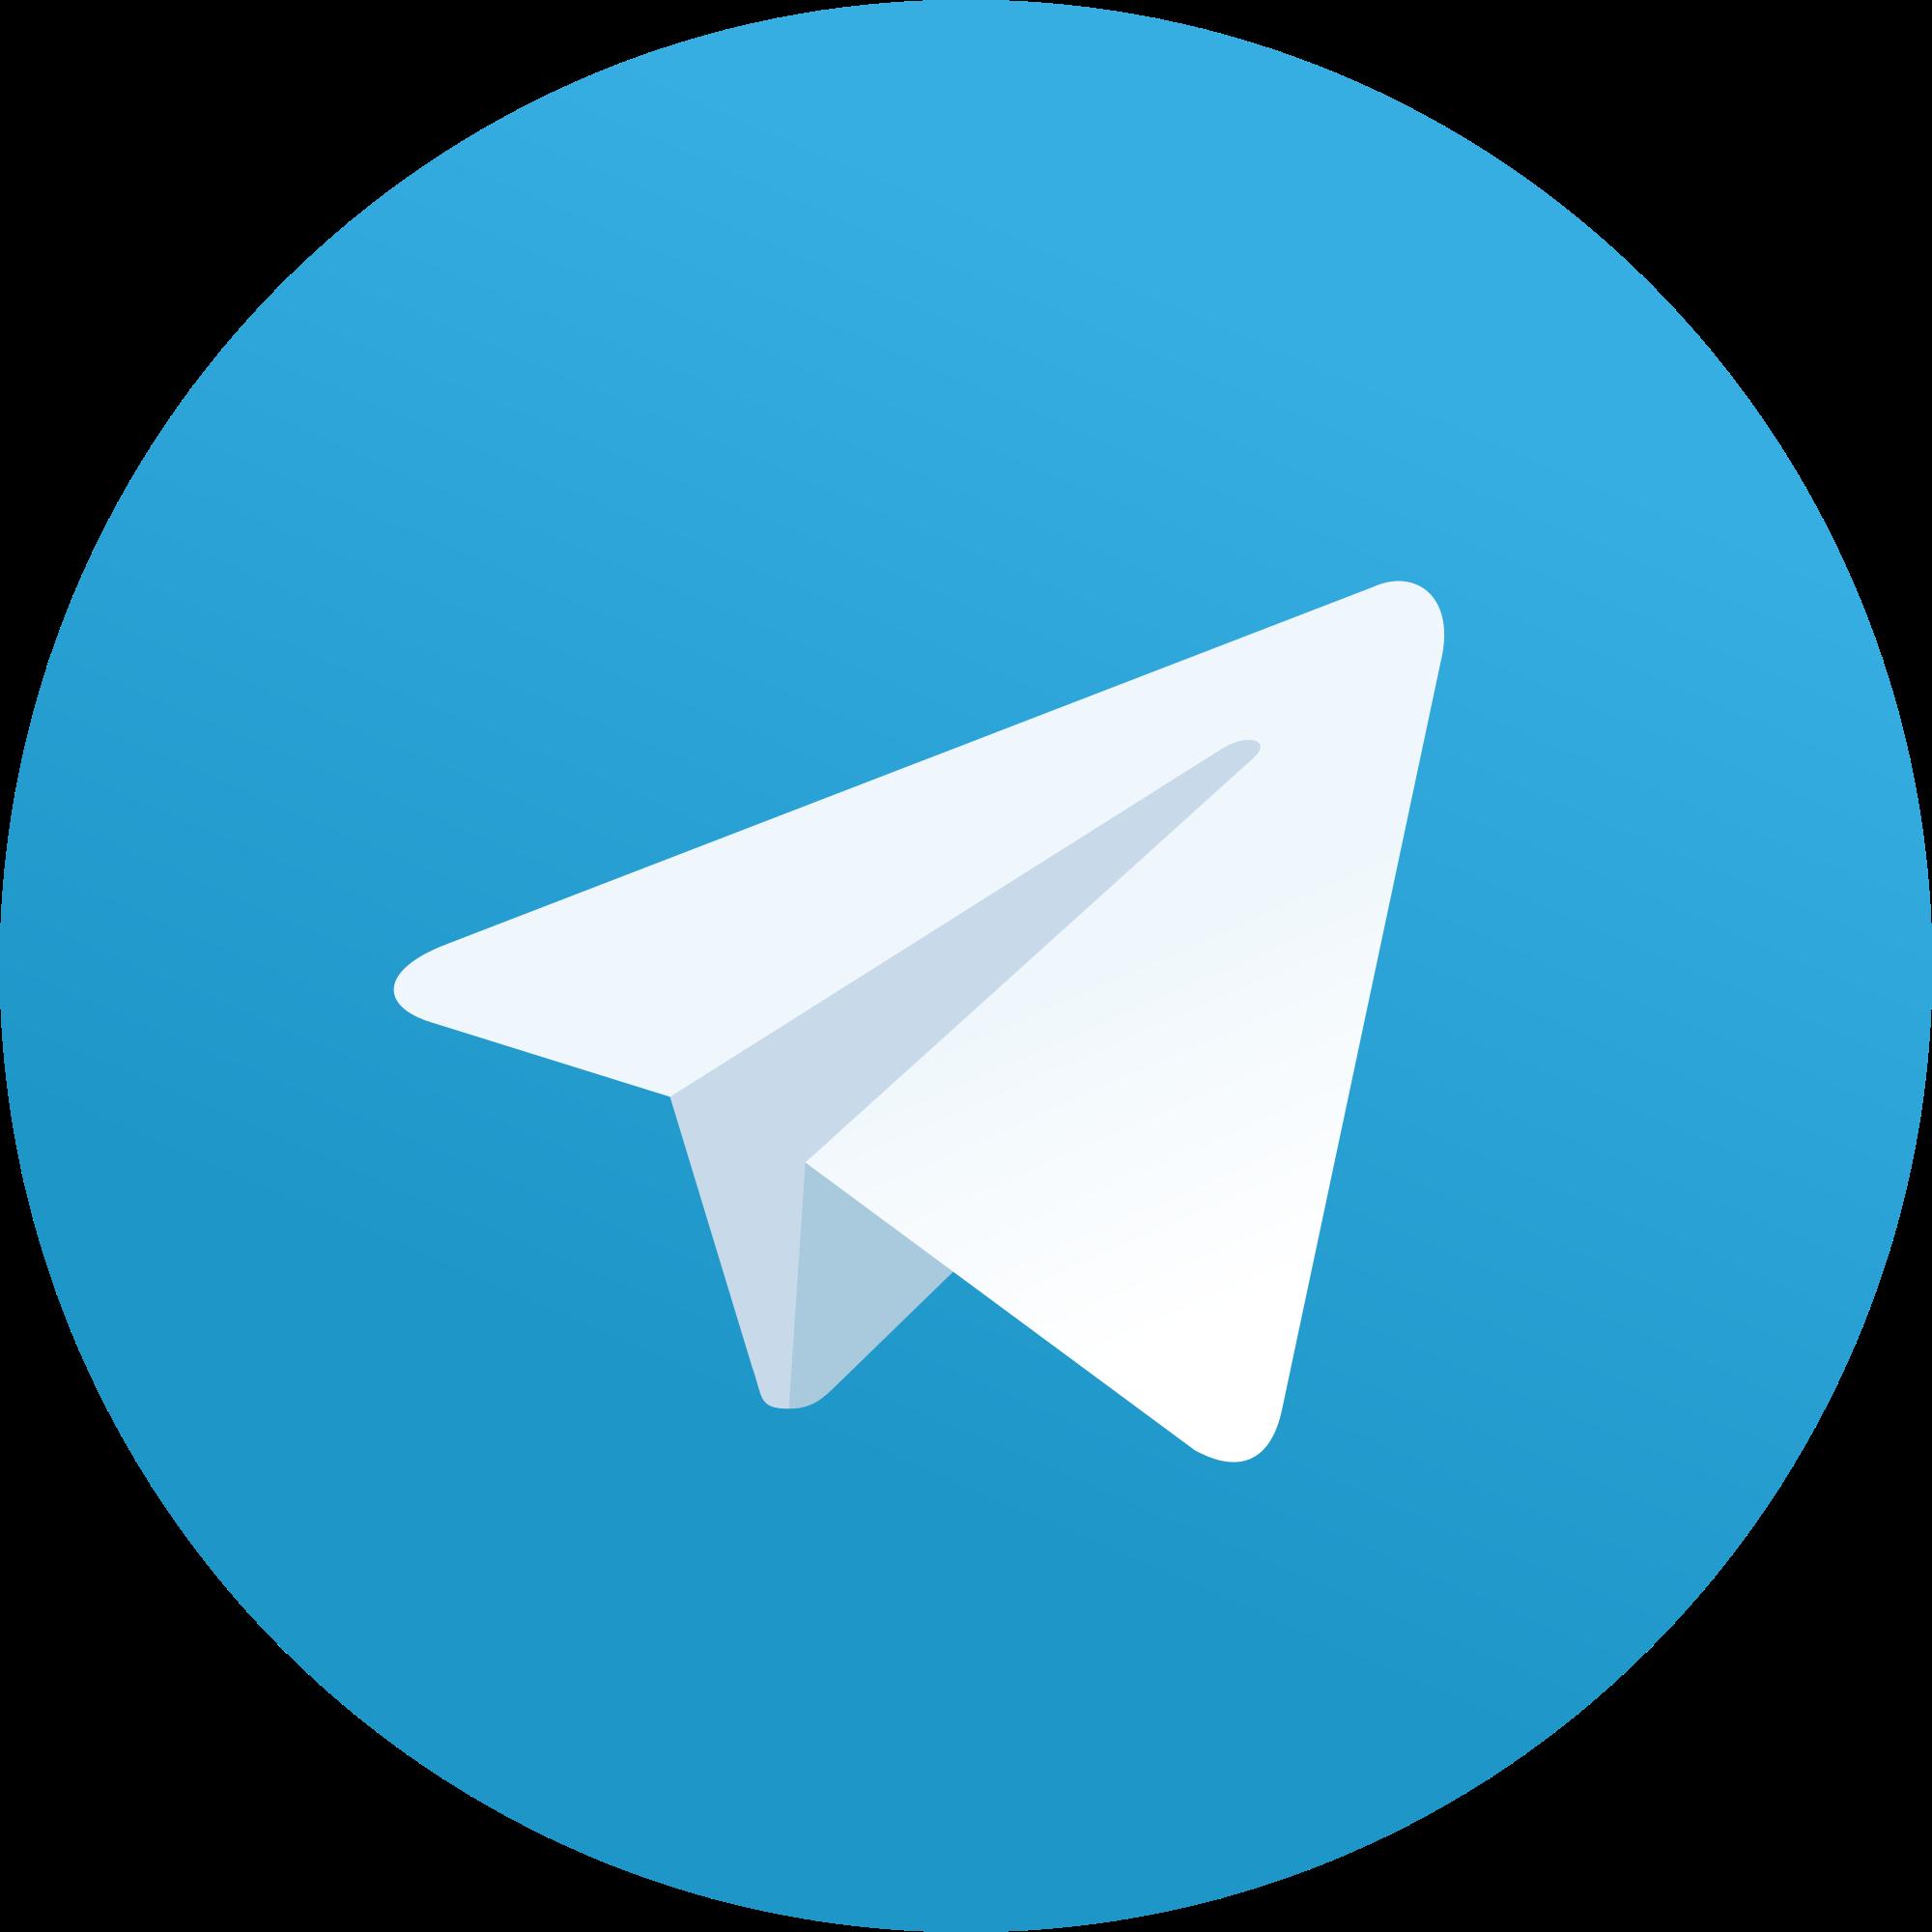 معرفی کانال تلگرامی کنفرانس